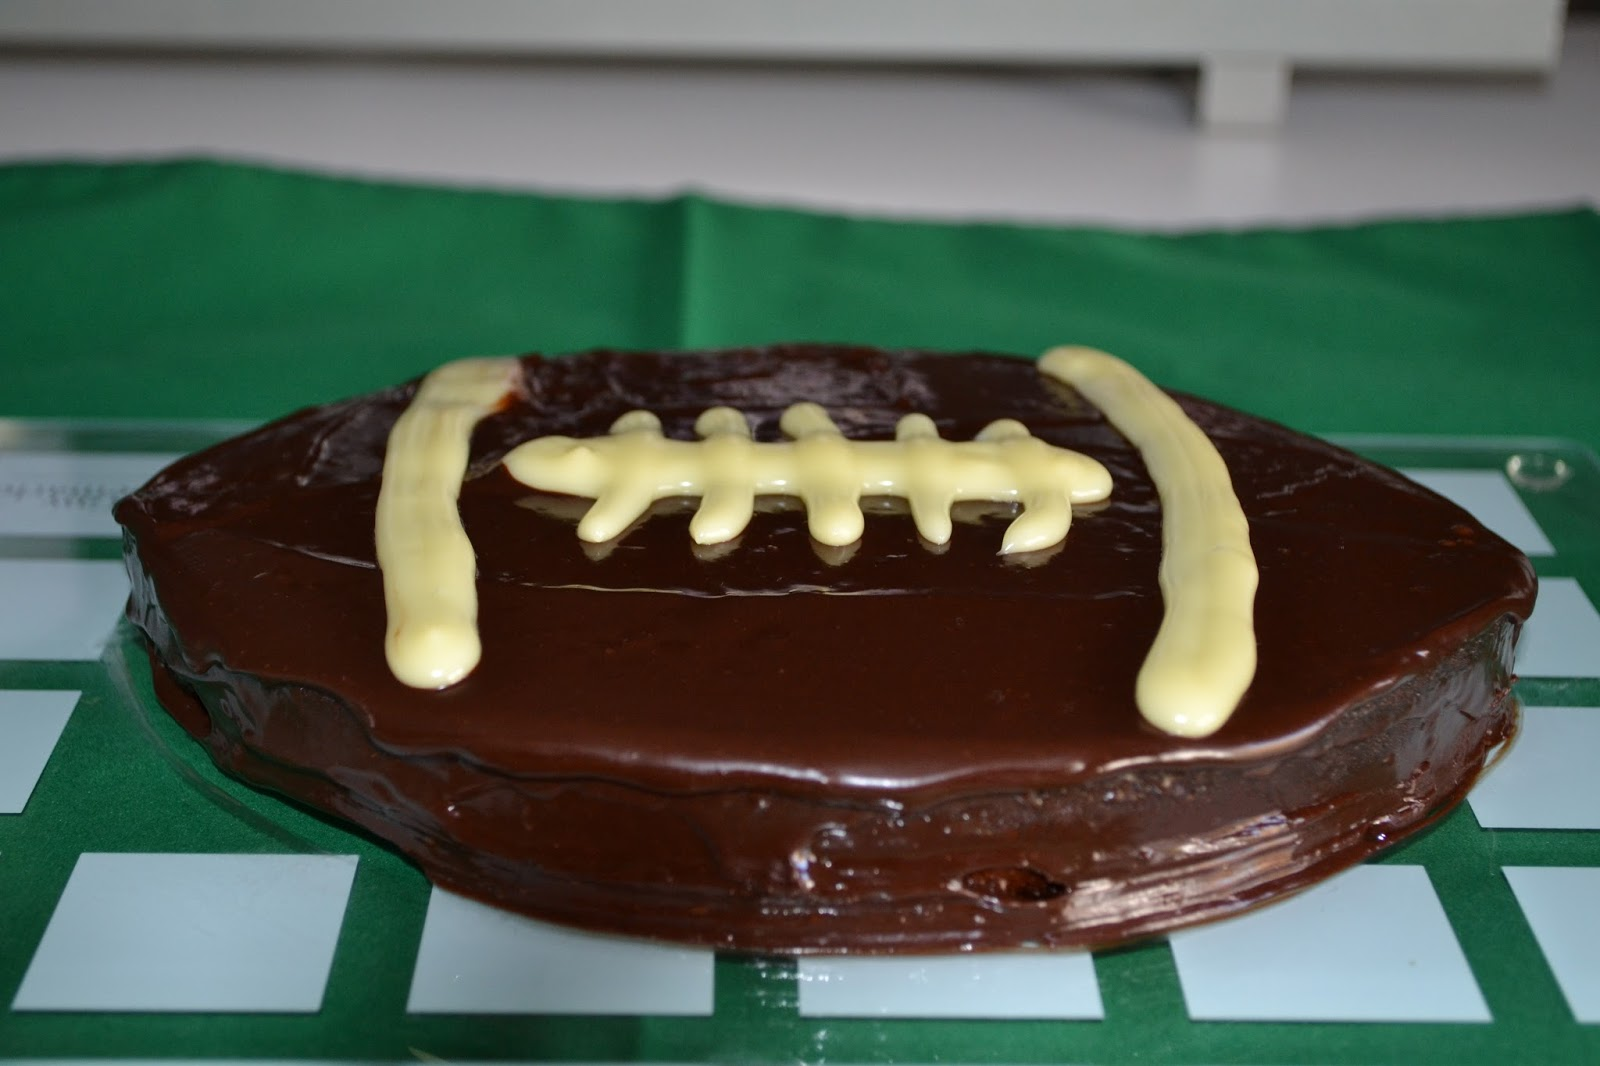 Priv de dessert g teau choco noisette ballon de rugby - Ballon rugby chocolat ...